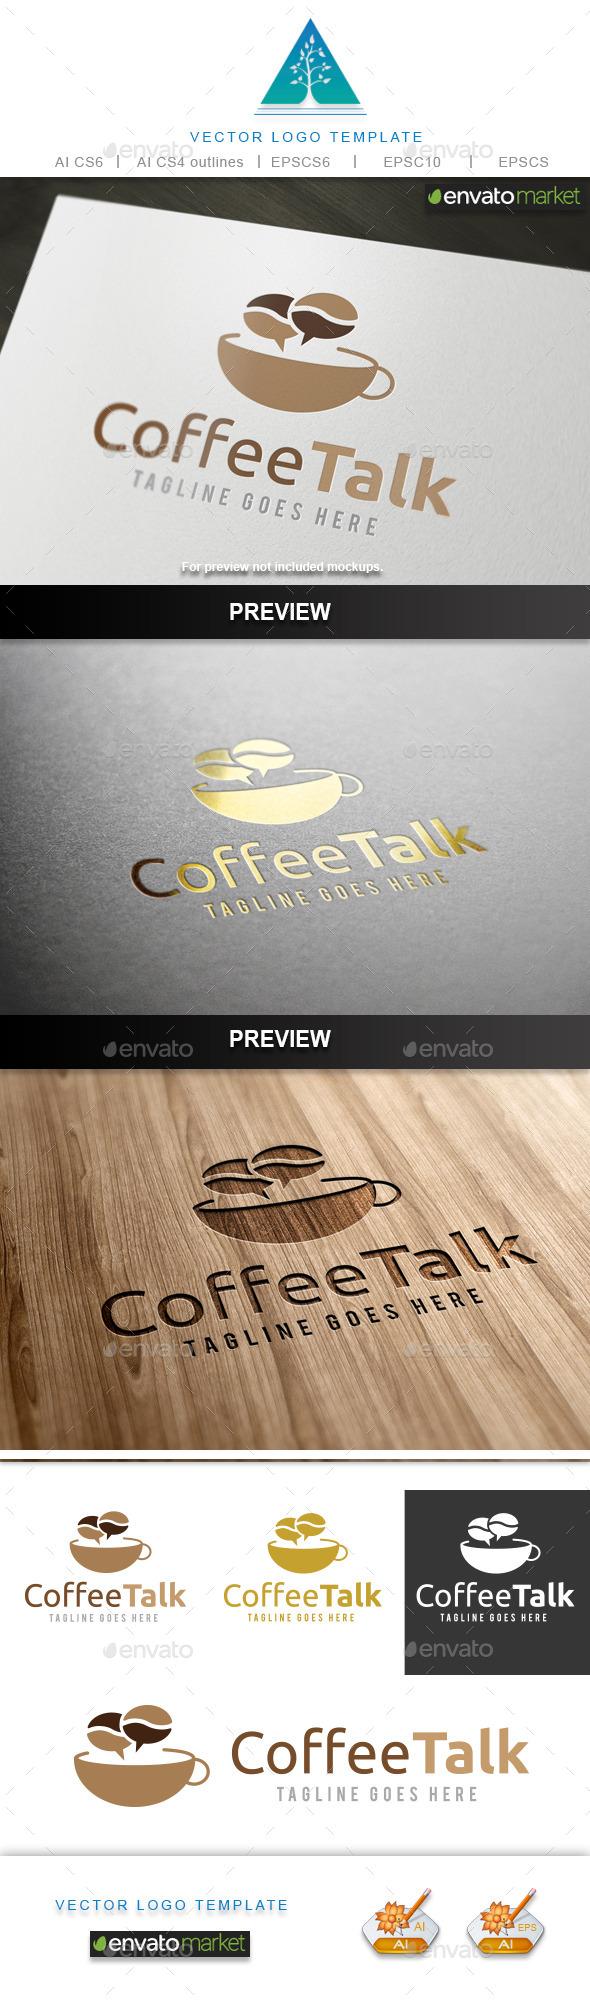 Coffee Talk 2 Logo